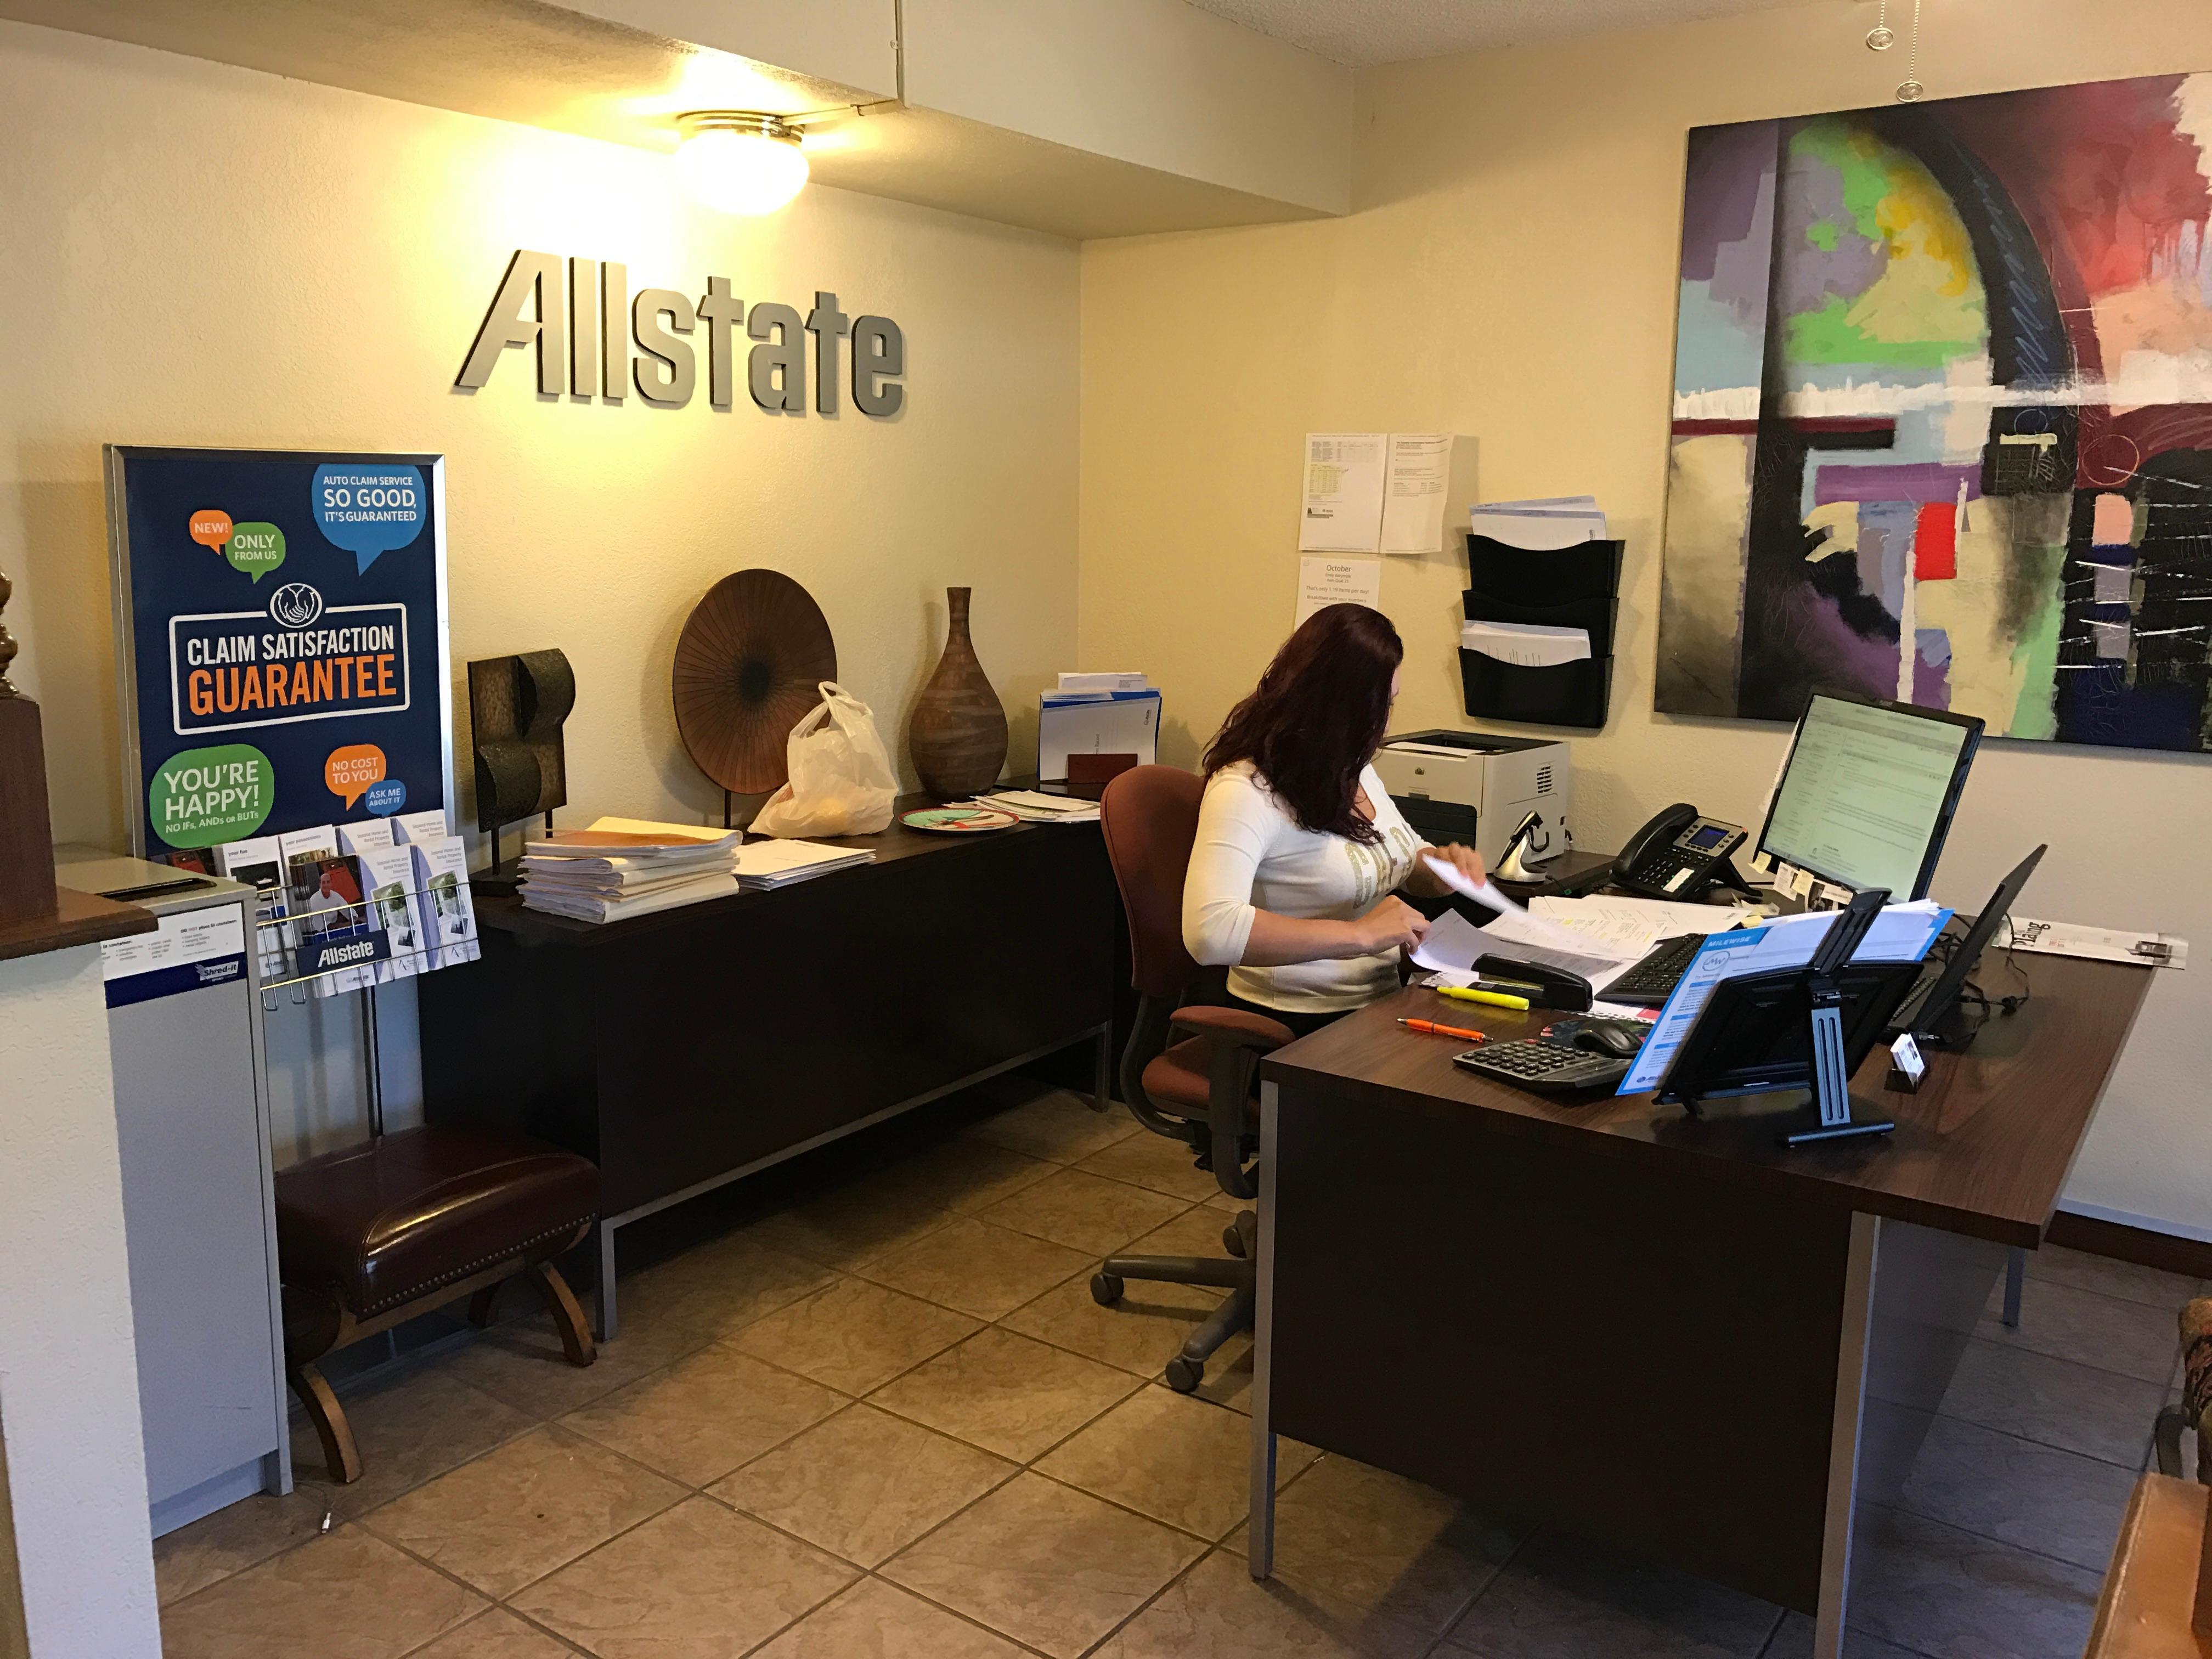 Paul Guerrero: Allstate Insurance